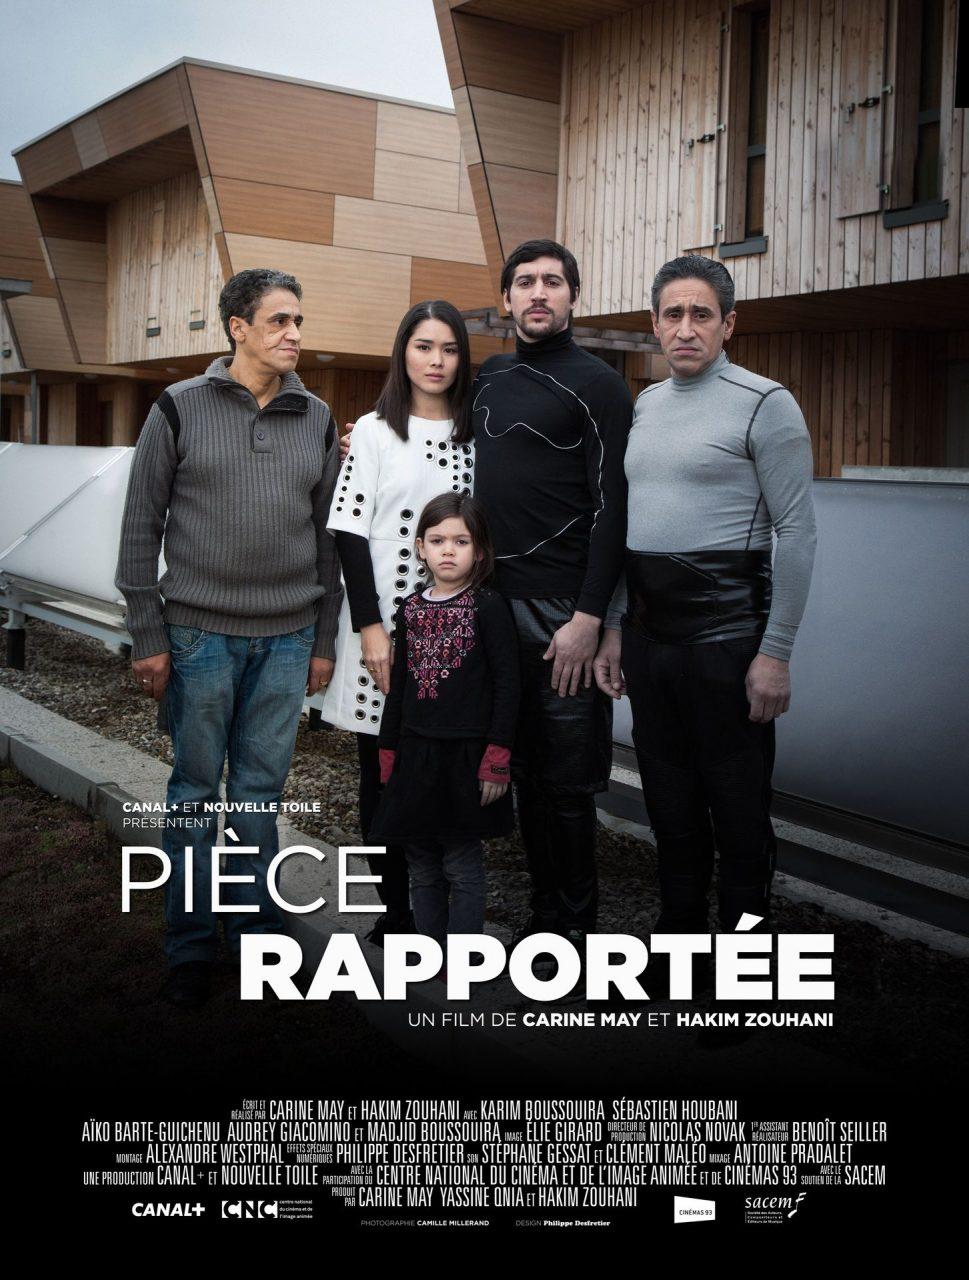 Piece_Rapportee_affiche_web1